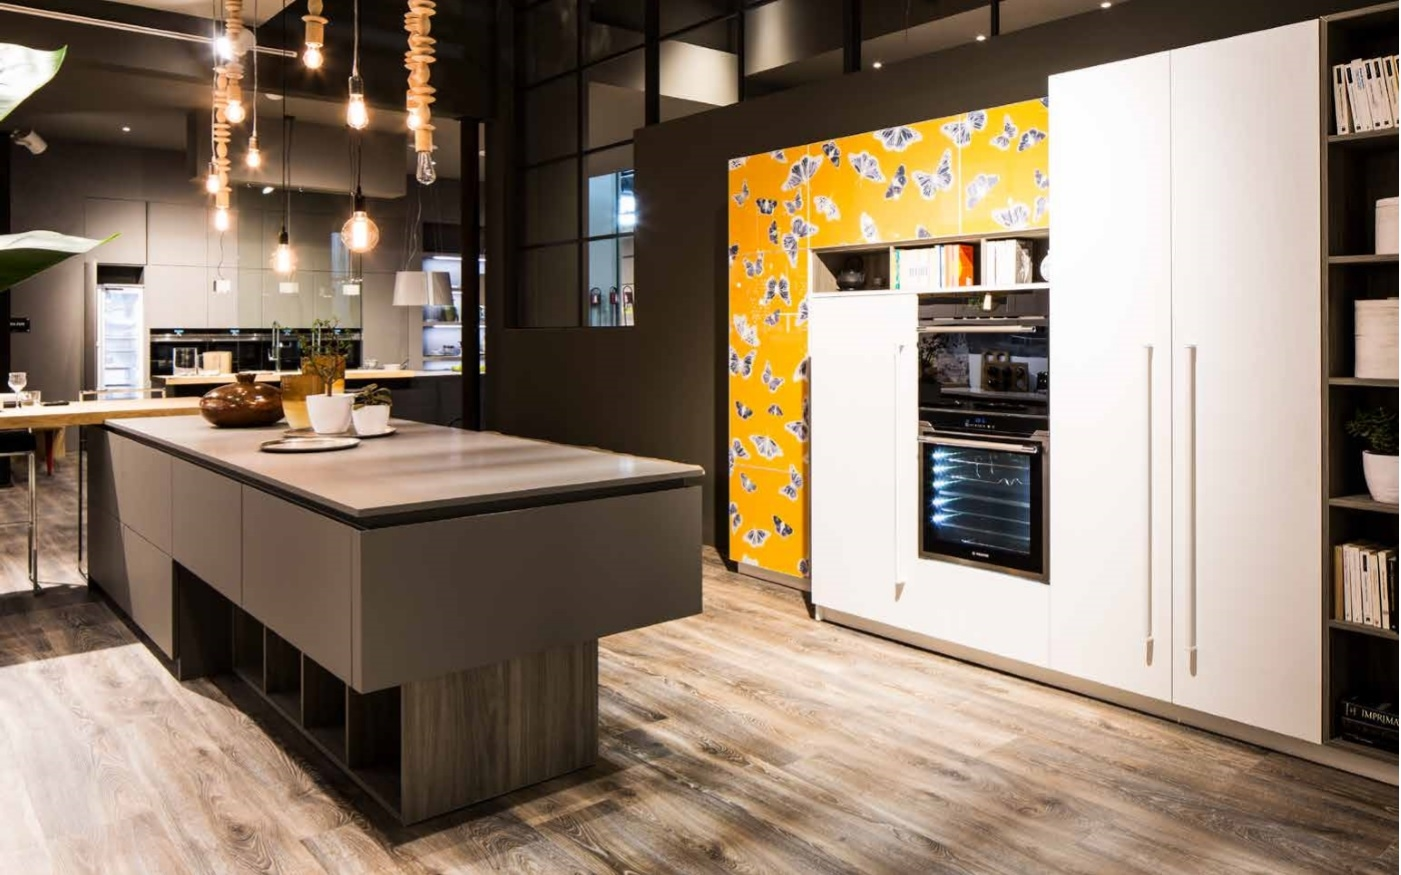 Cucina con isola arrex cucine scontata del 50 cucine a - Cucine con isola ...